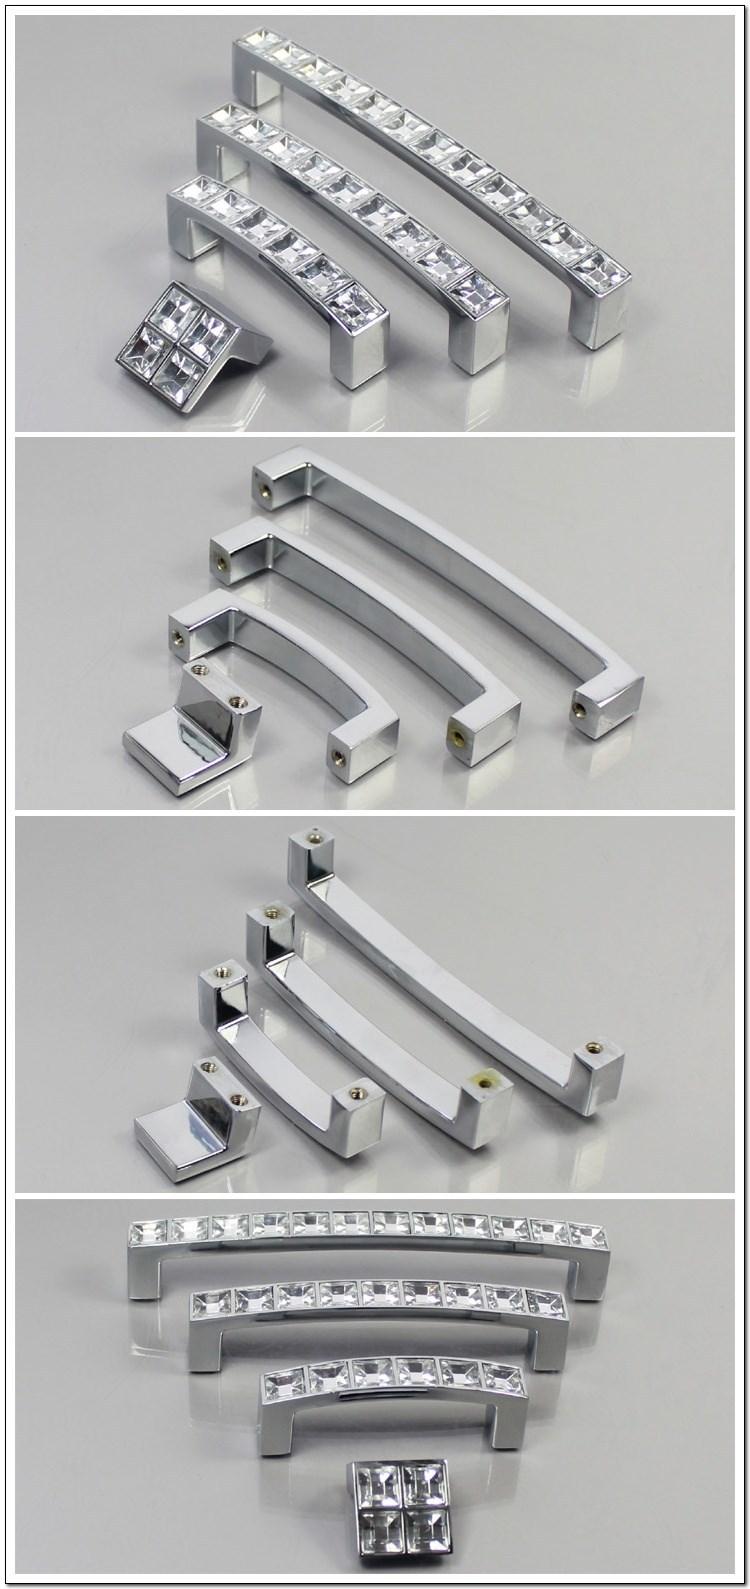 Clear Crystal Acrylic Kitchen Cabinet Door Drawer Hardware Pull Handle Knob Bar